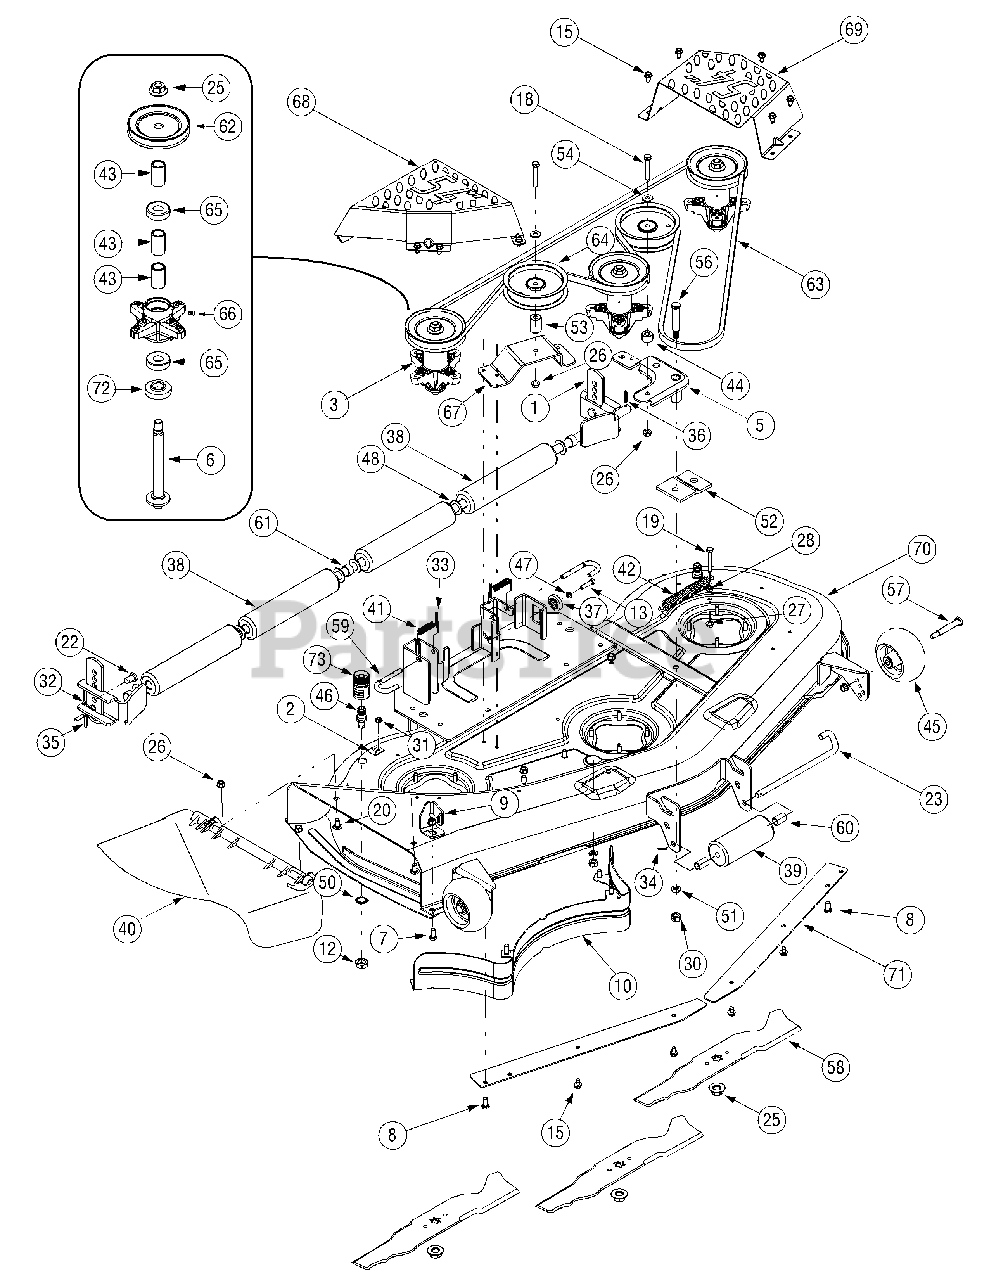 DIAGRAM] Cub Cadet Mowing Deck Diagram FULL Version HD Quality ...